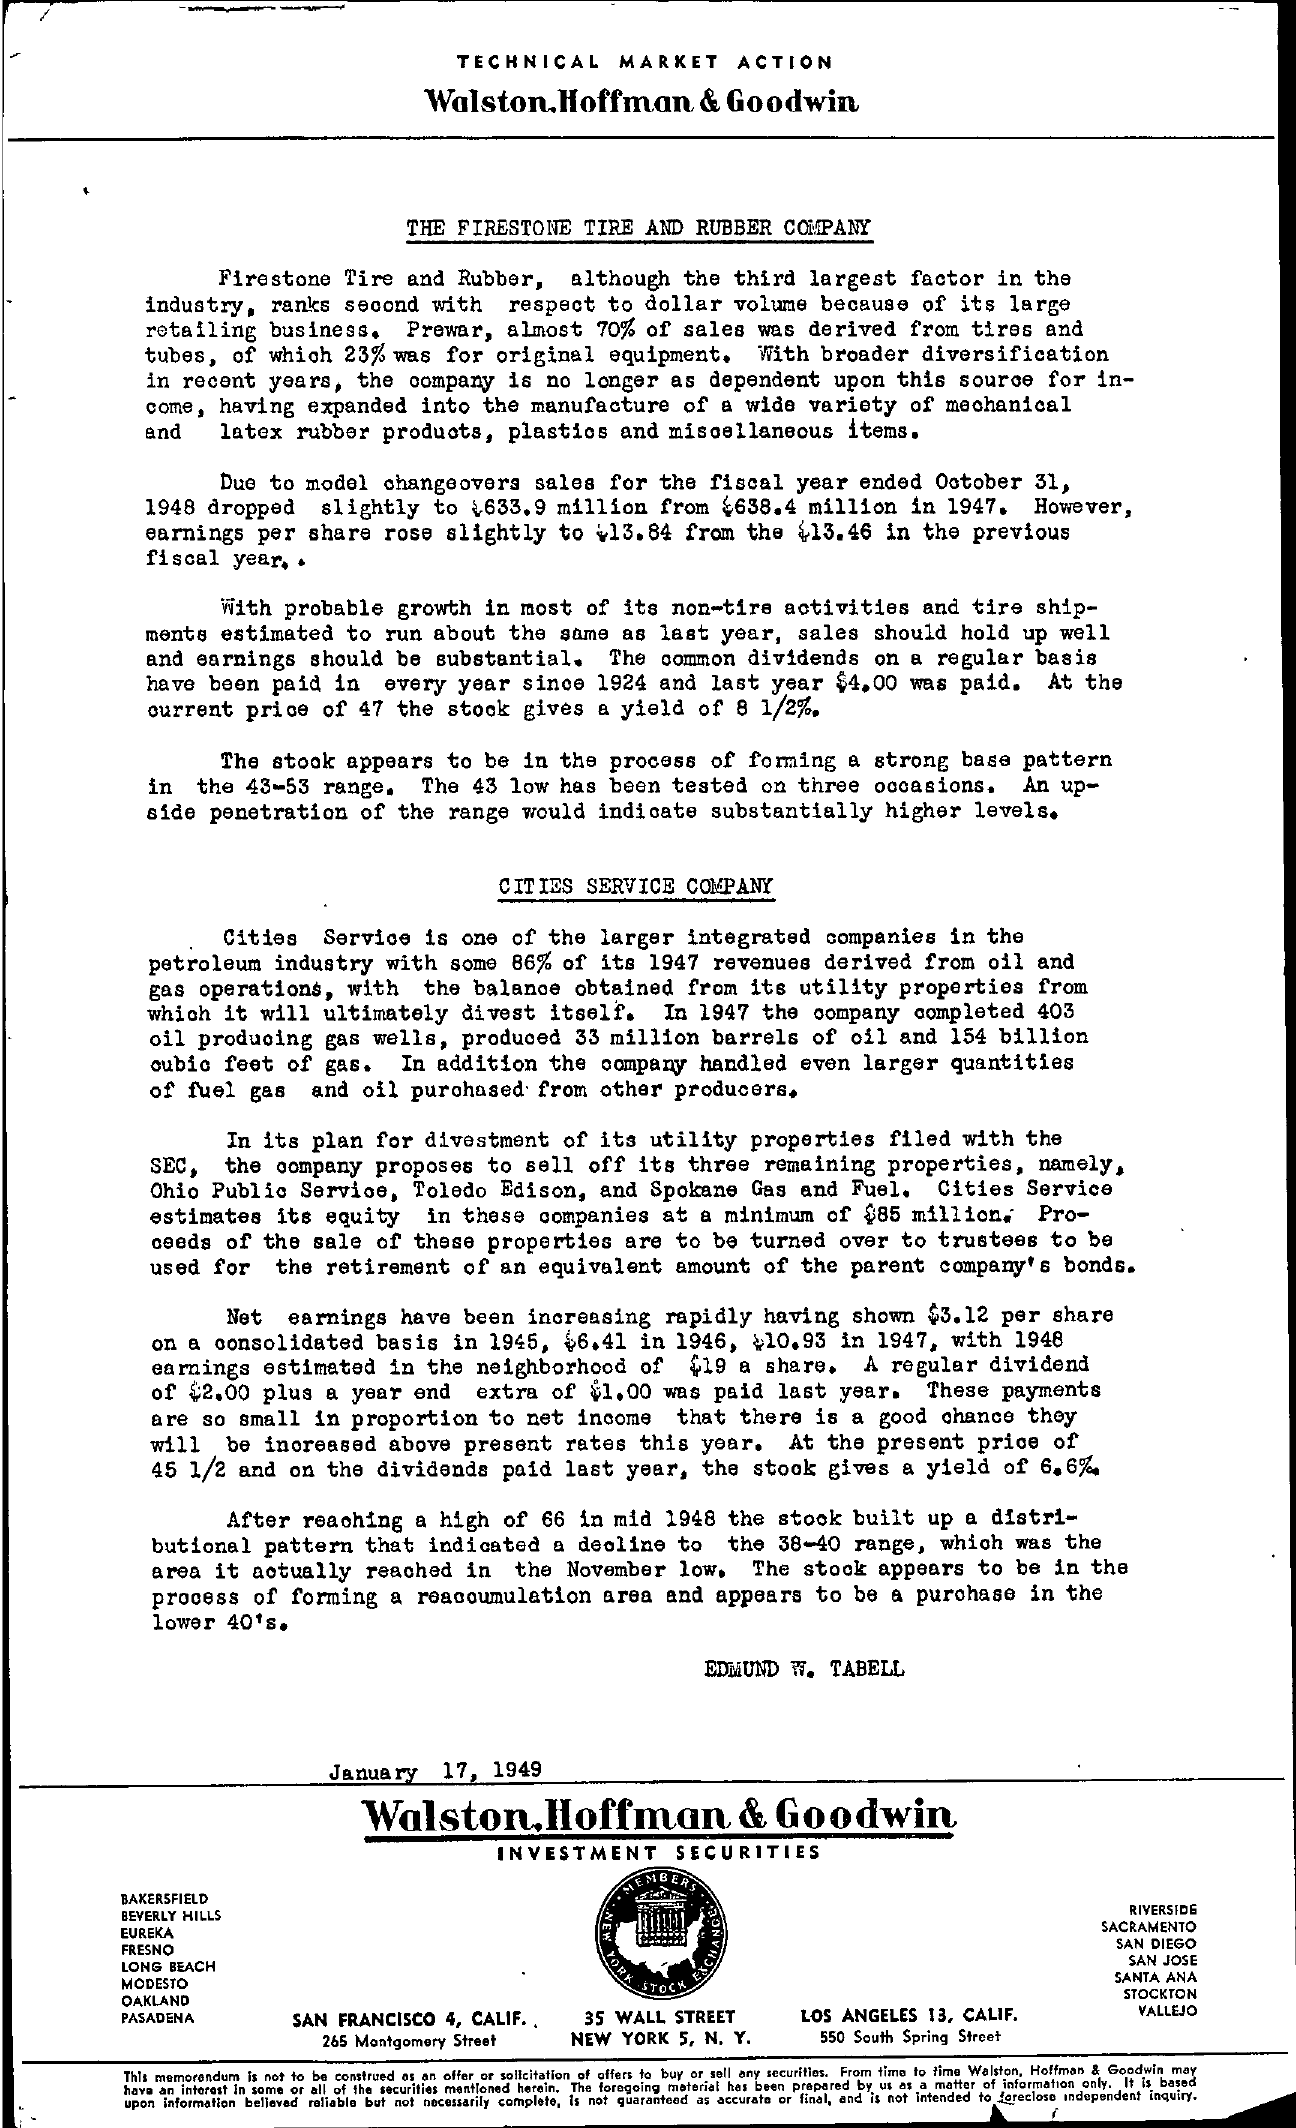 Tabell's Market Letter - January 17, 1949